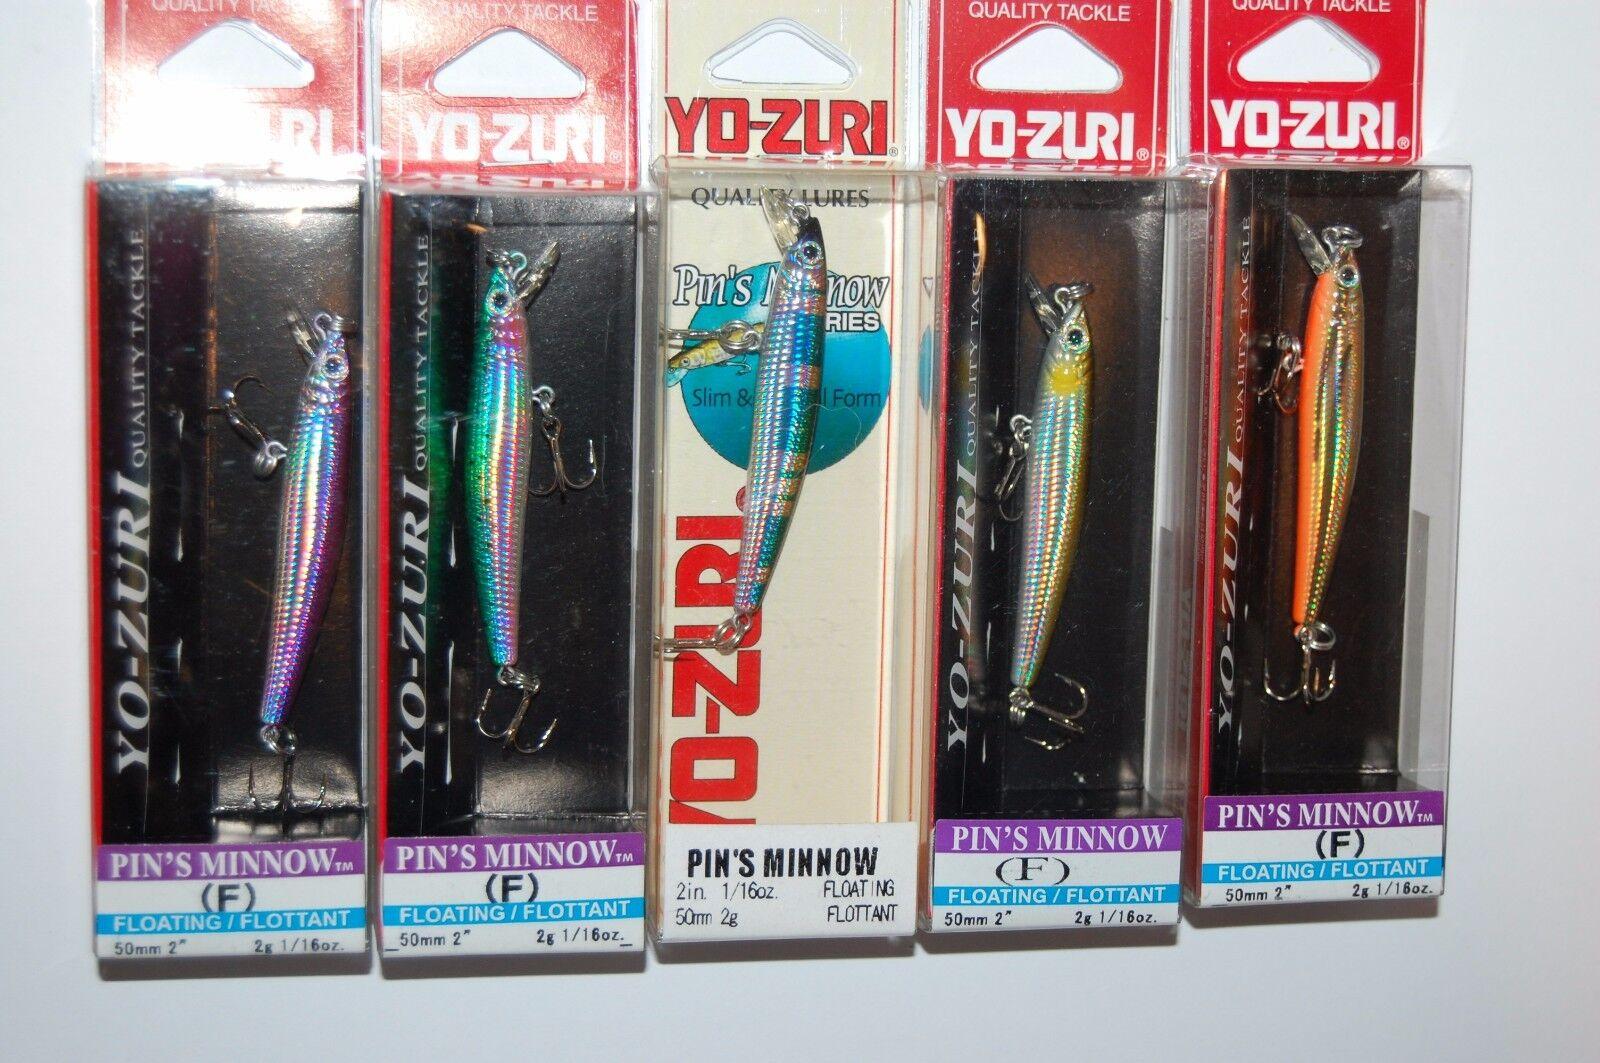 5 lures yo zuri  pins pin's minnow f196 2  1 16oz rainbow trout lure assortment  offering store